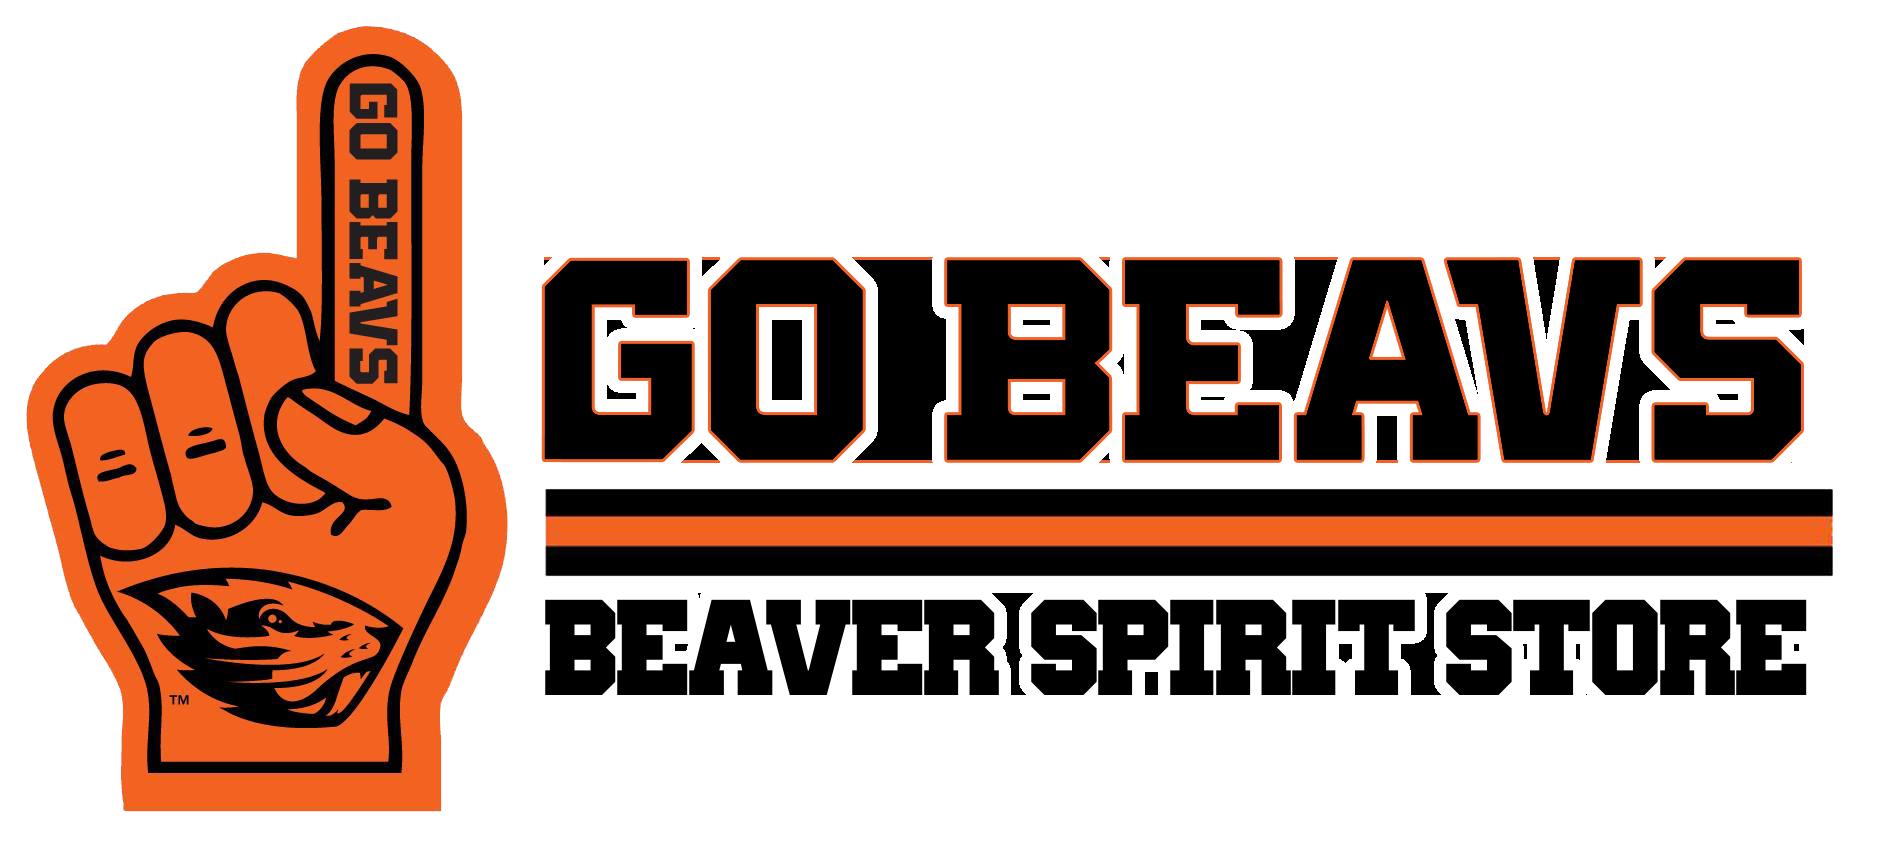 Beavs PAC-12 Football Shirt